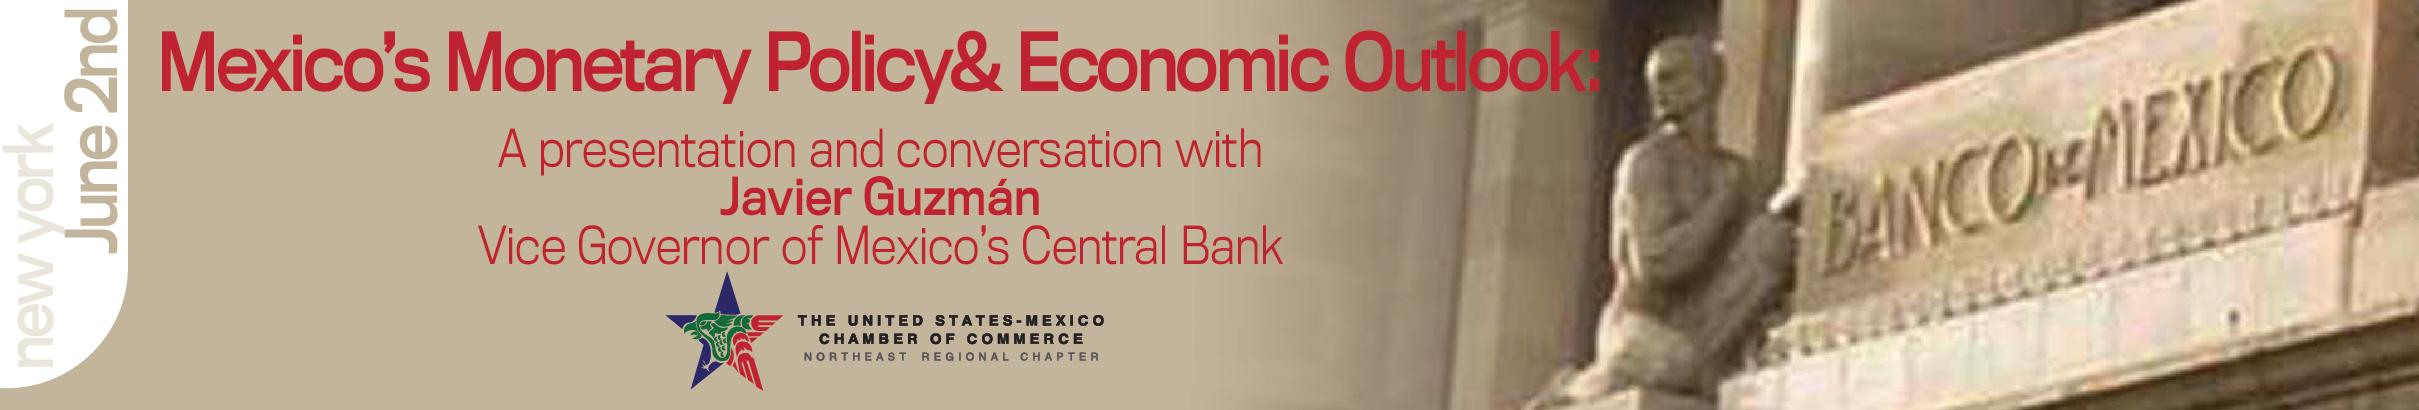 Mexico's Monetary Policy & Economic Outlook